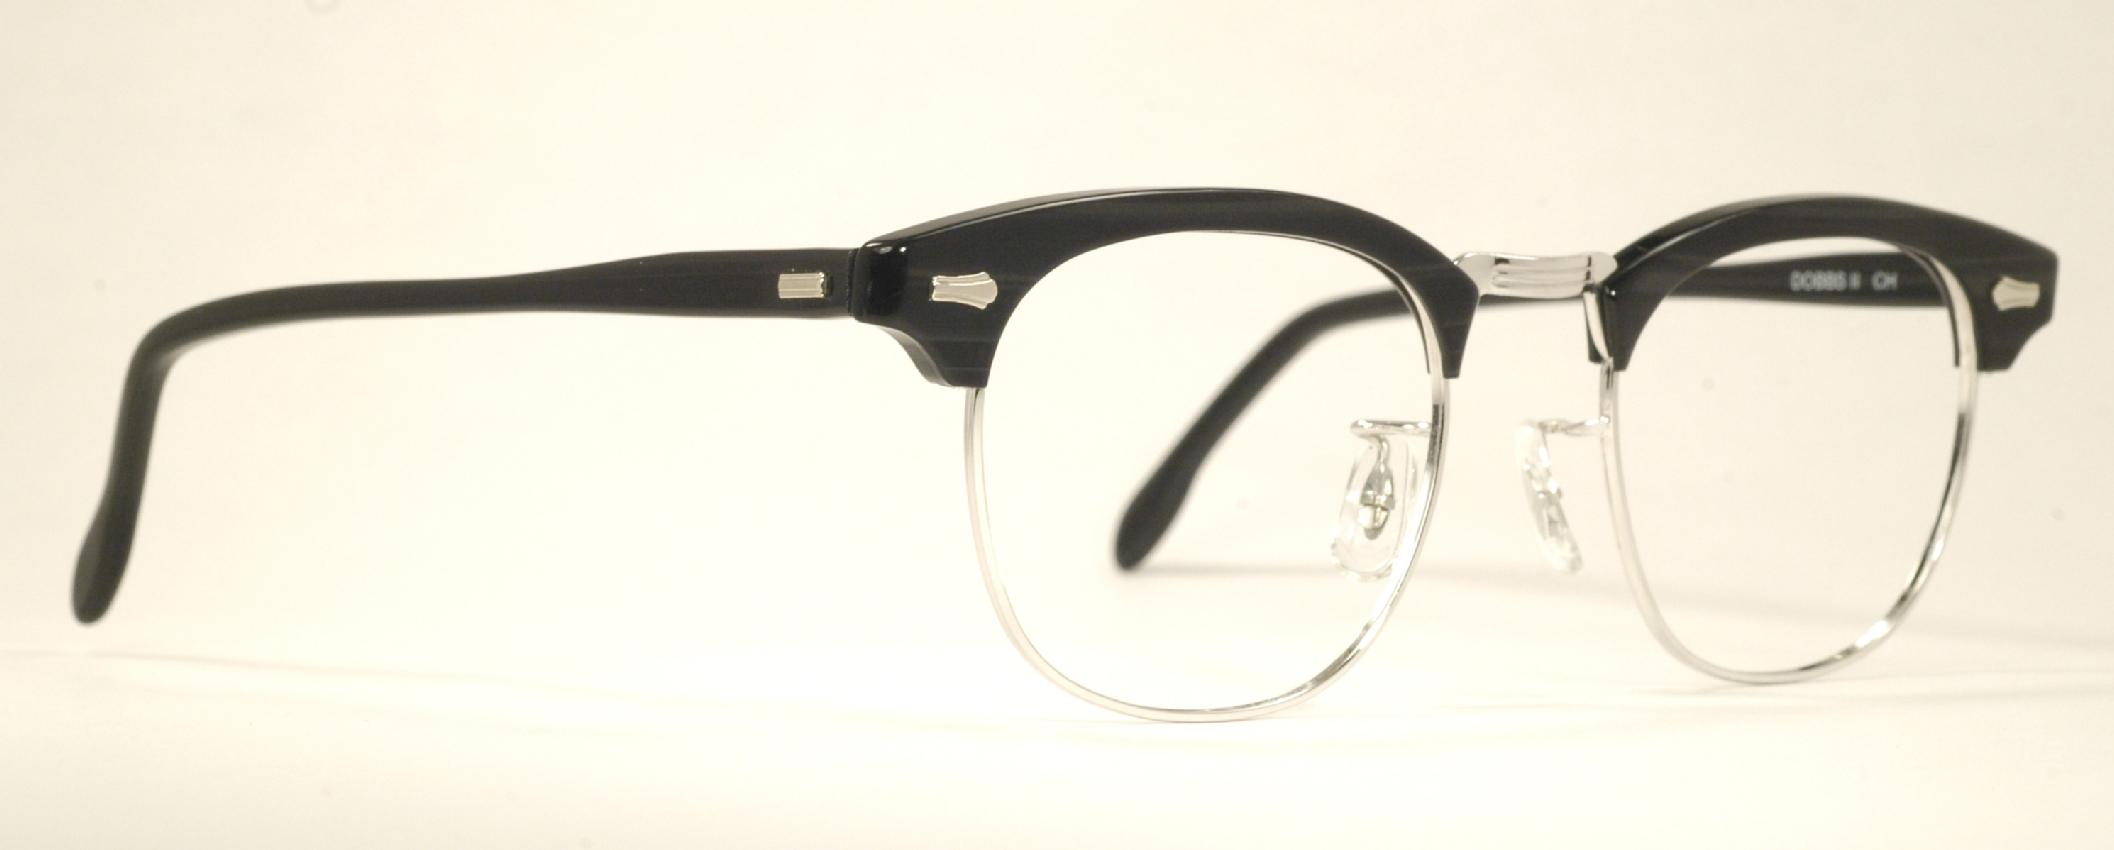 Optometrist Attic - SRO G-MAN MALCOLM X VINTAGE BLACK SILVER EYEGLASSES